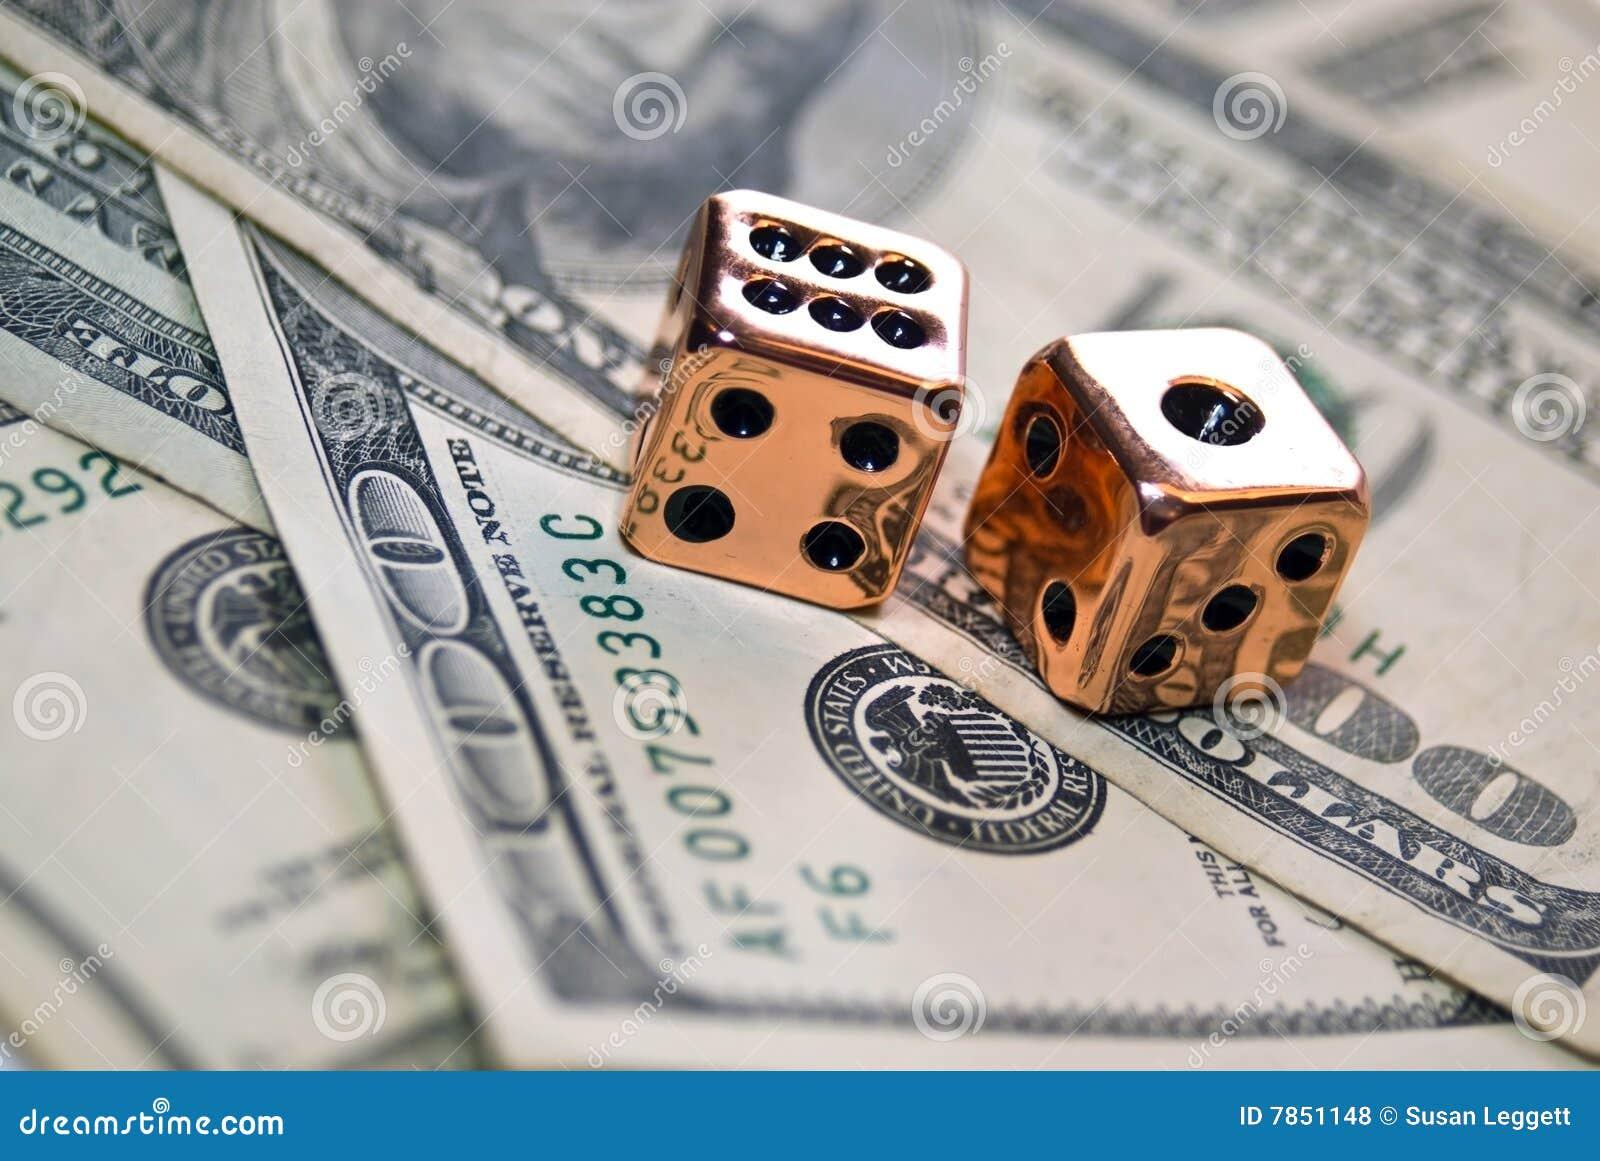 Keine anzahlung mobile casino 2014